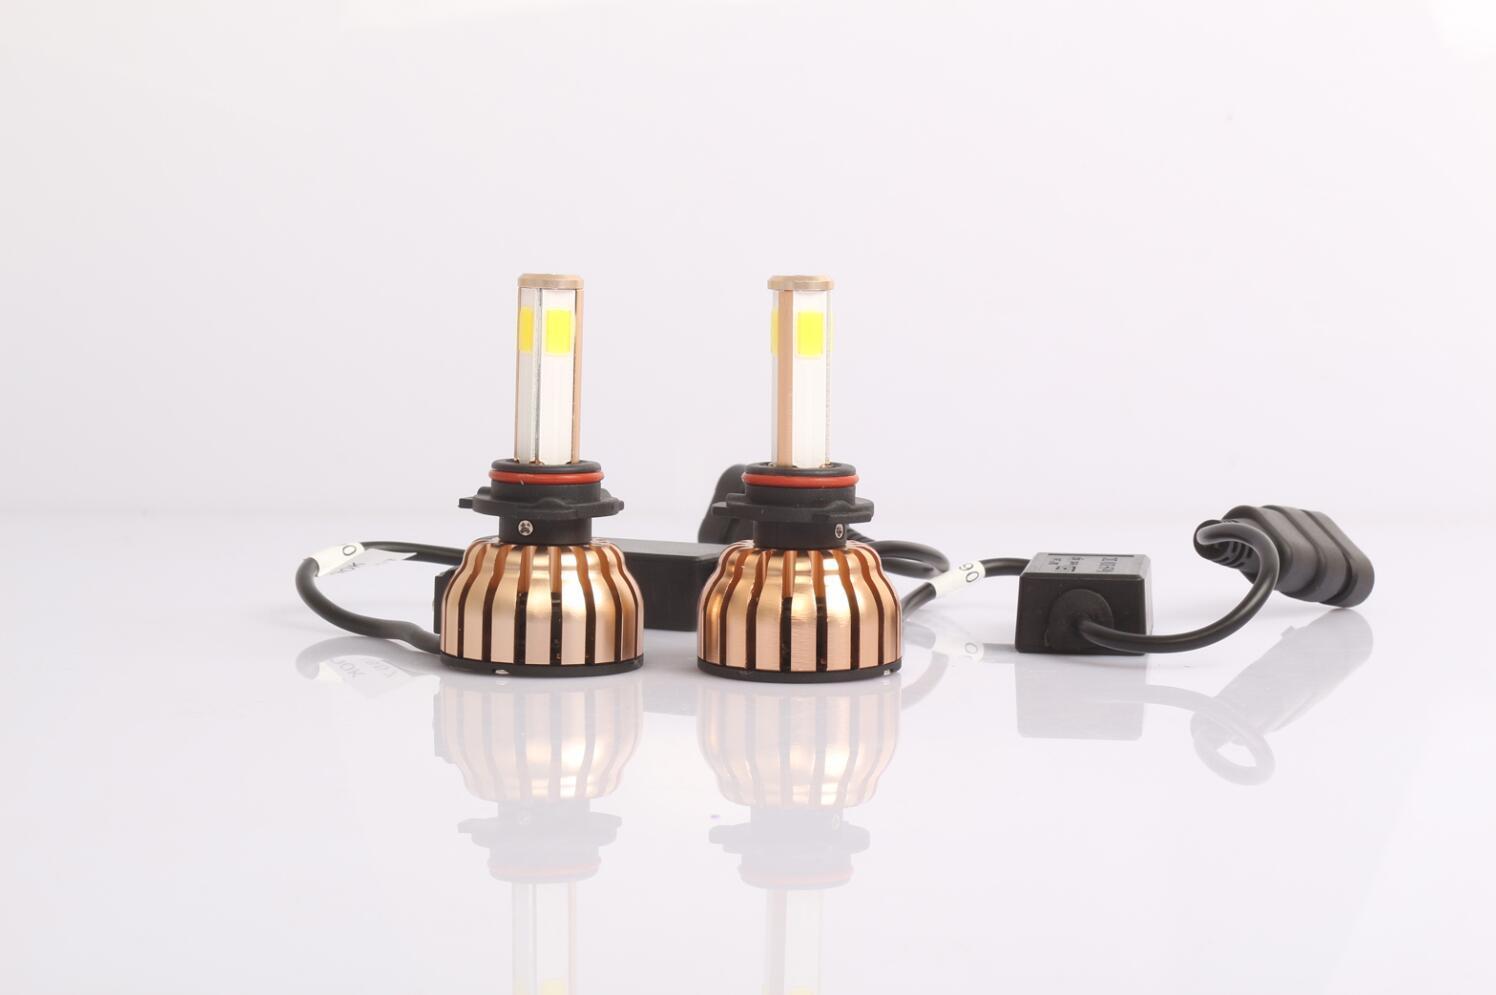 Hot Selling IP68 6000k 36W High Low Beam High Power Car H4 LED Headlight